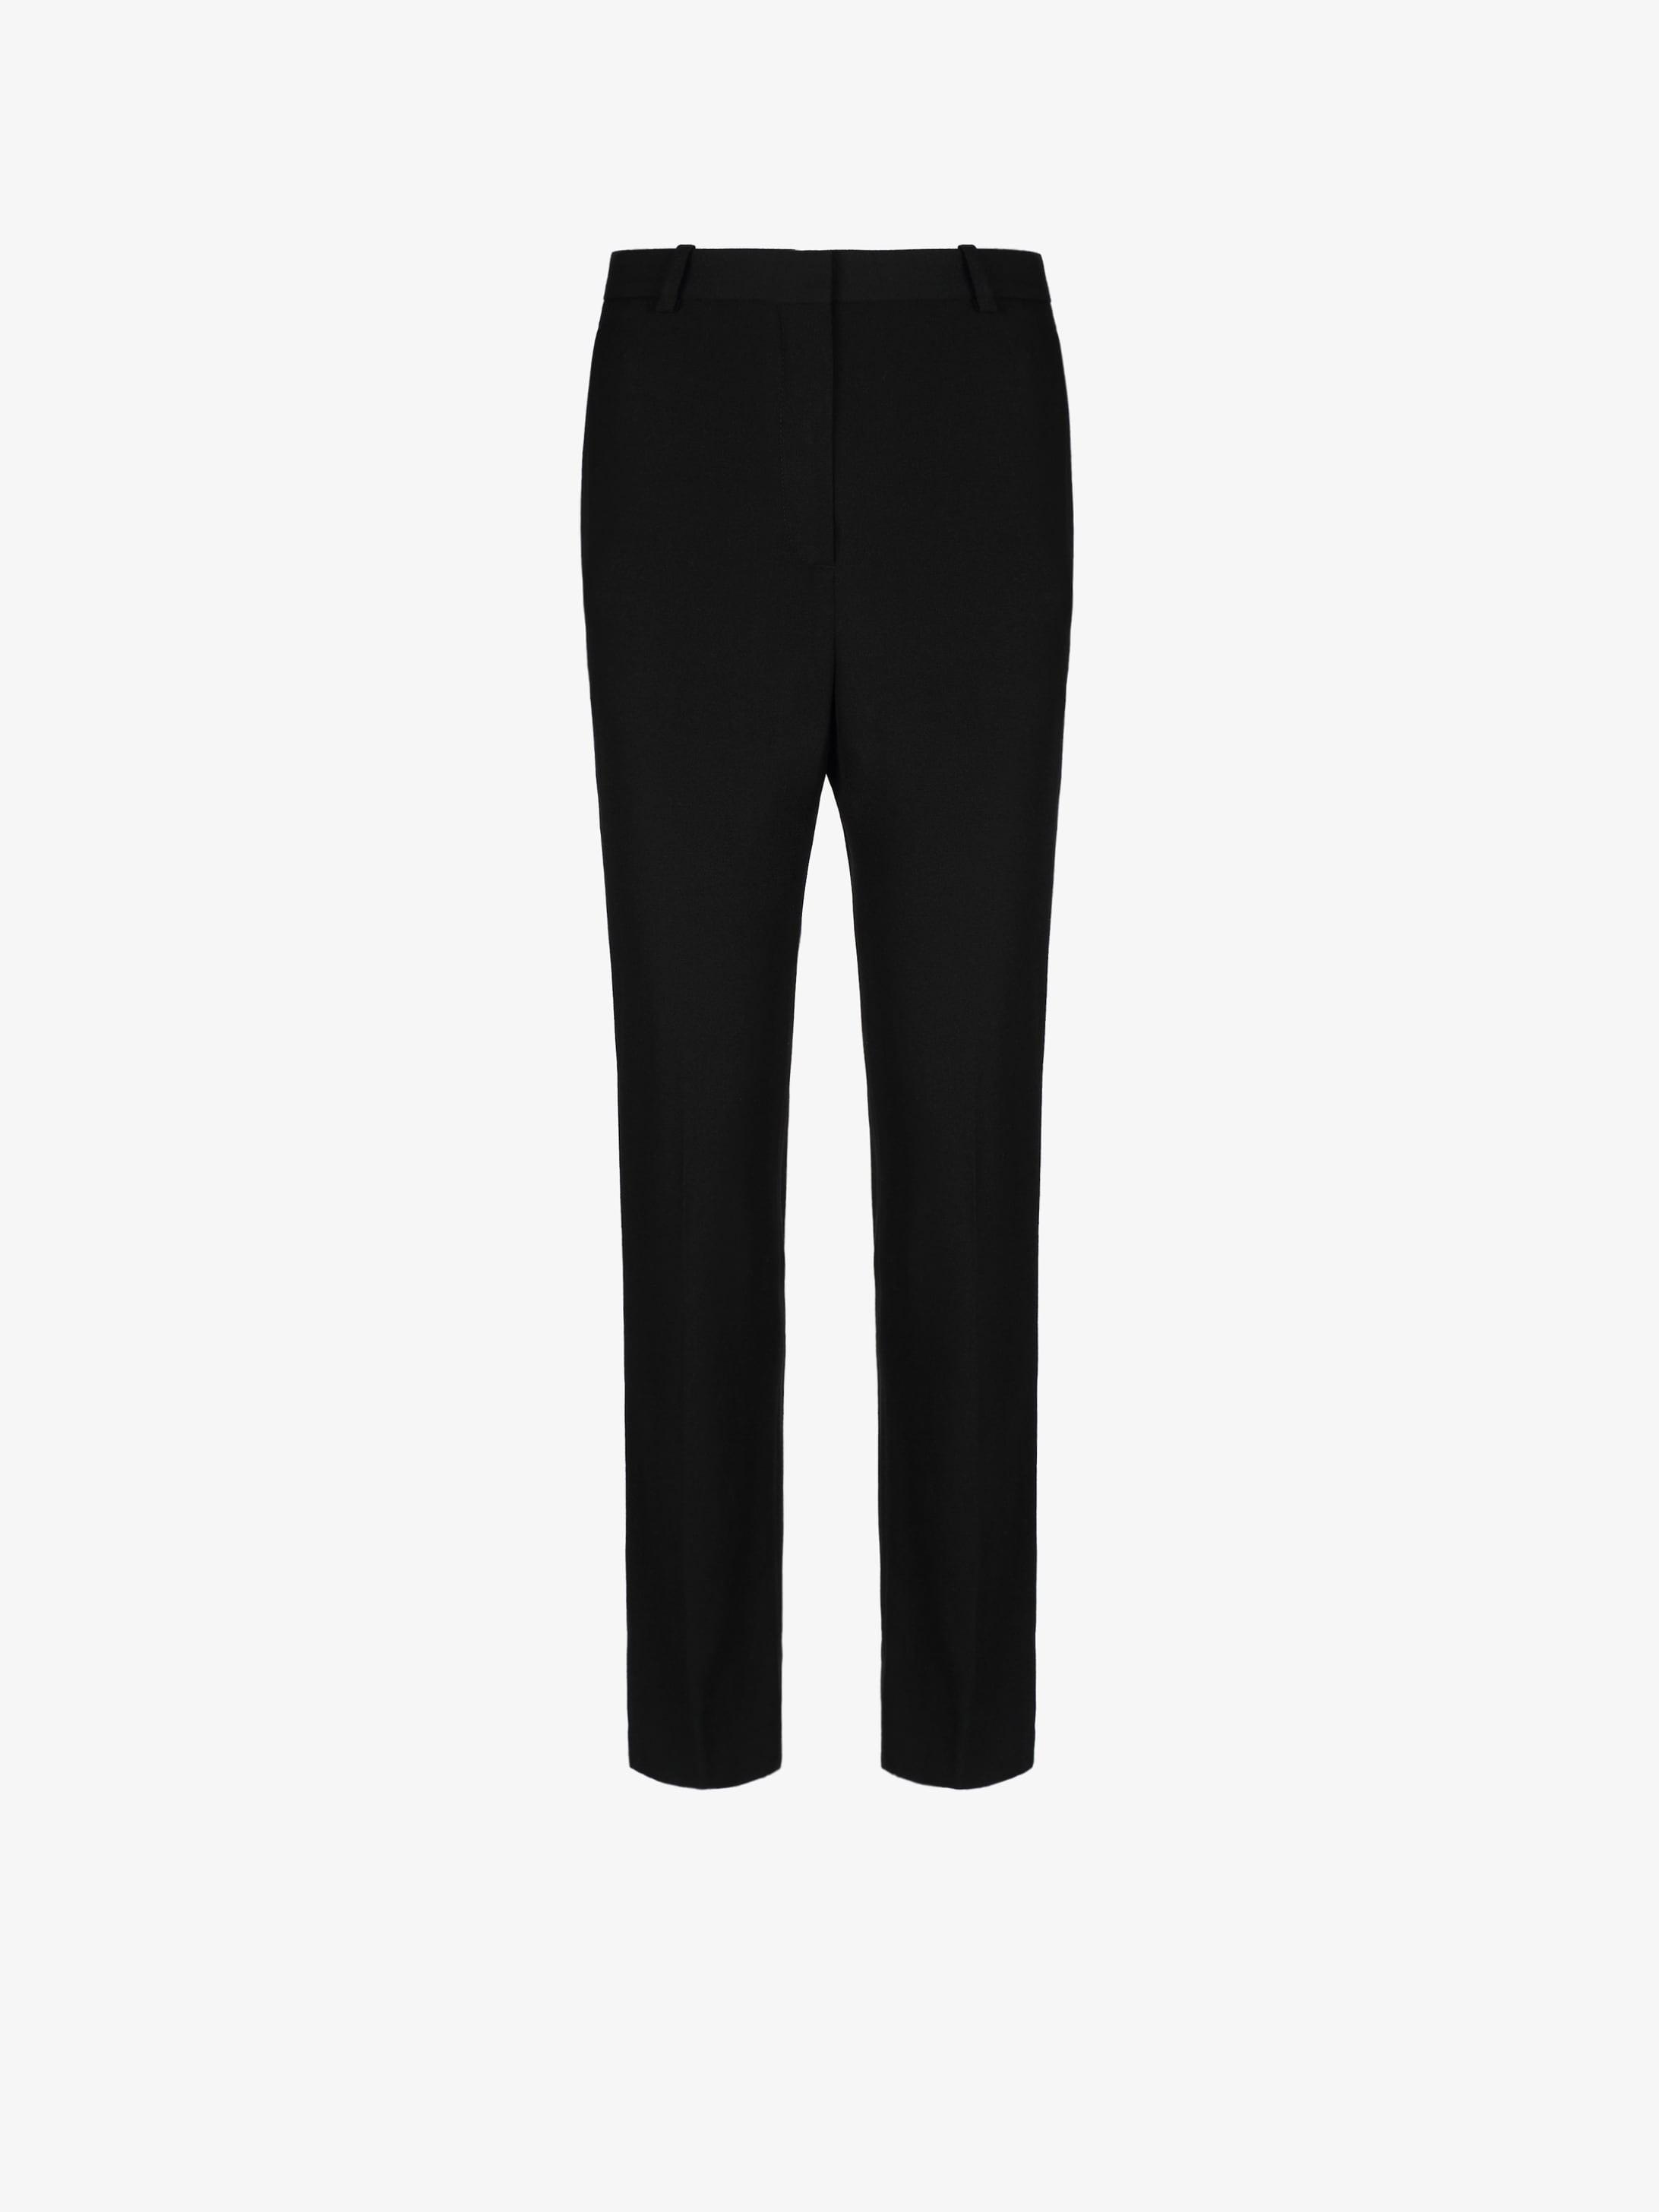 Slim fit trousers in grain de poudre